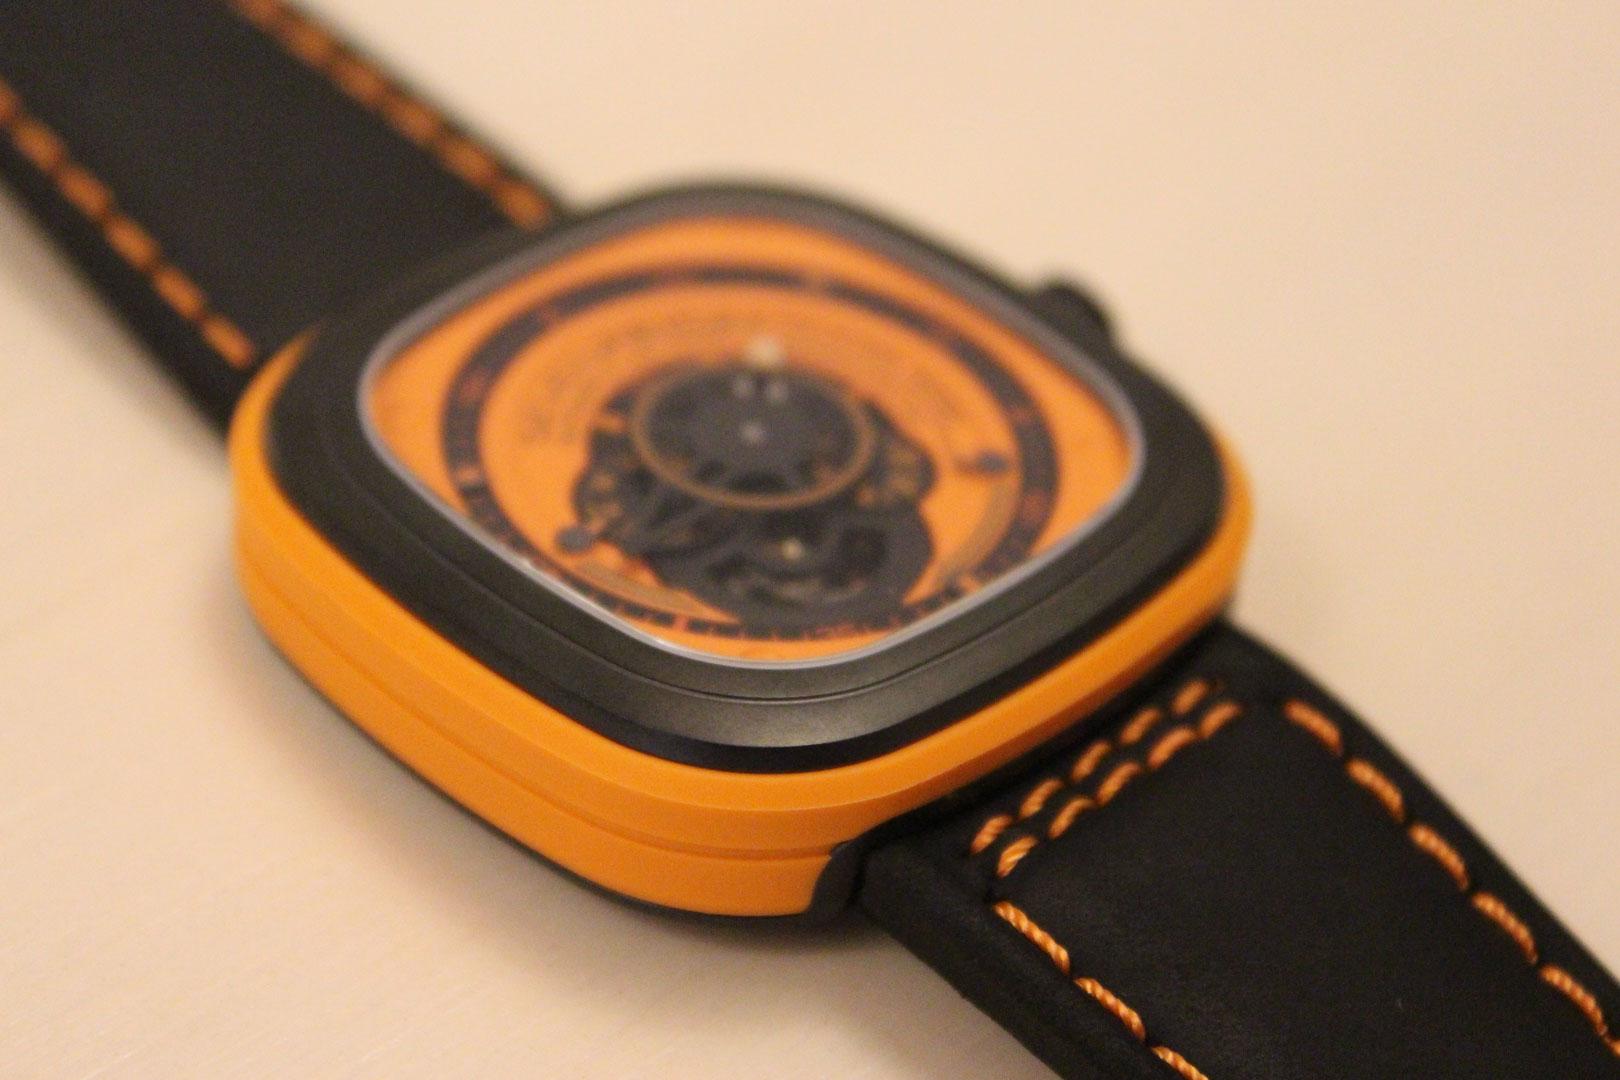 Sevenfriday-profile-orange